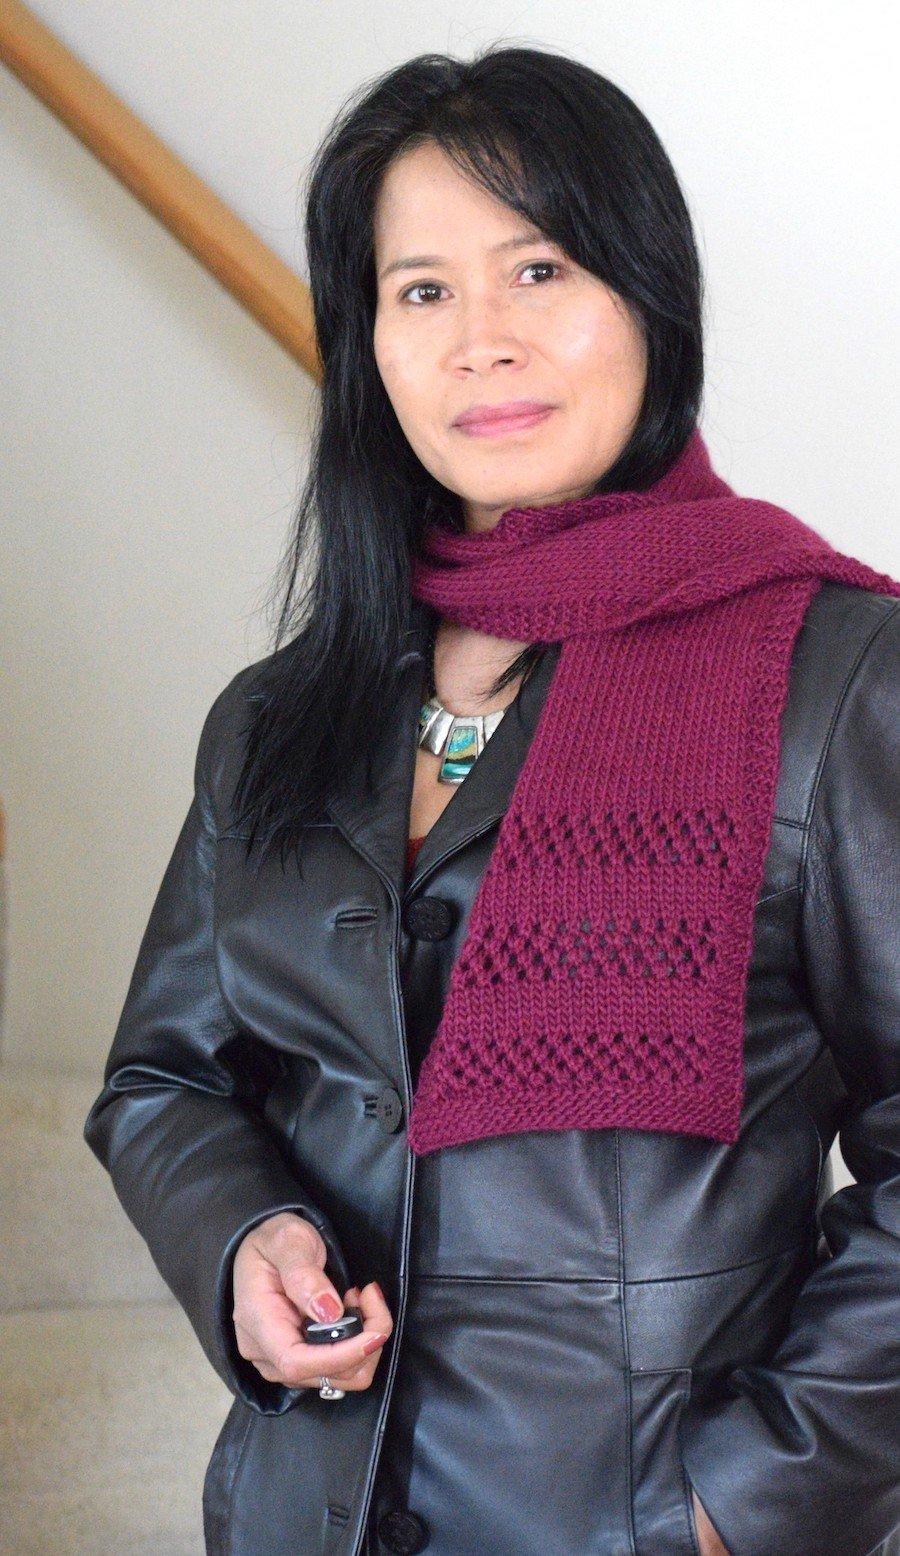 I'm wearing newly made beginner eyelet scarf.